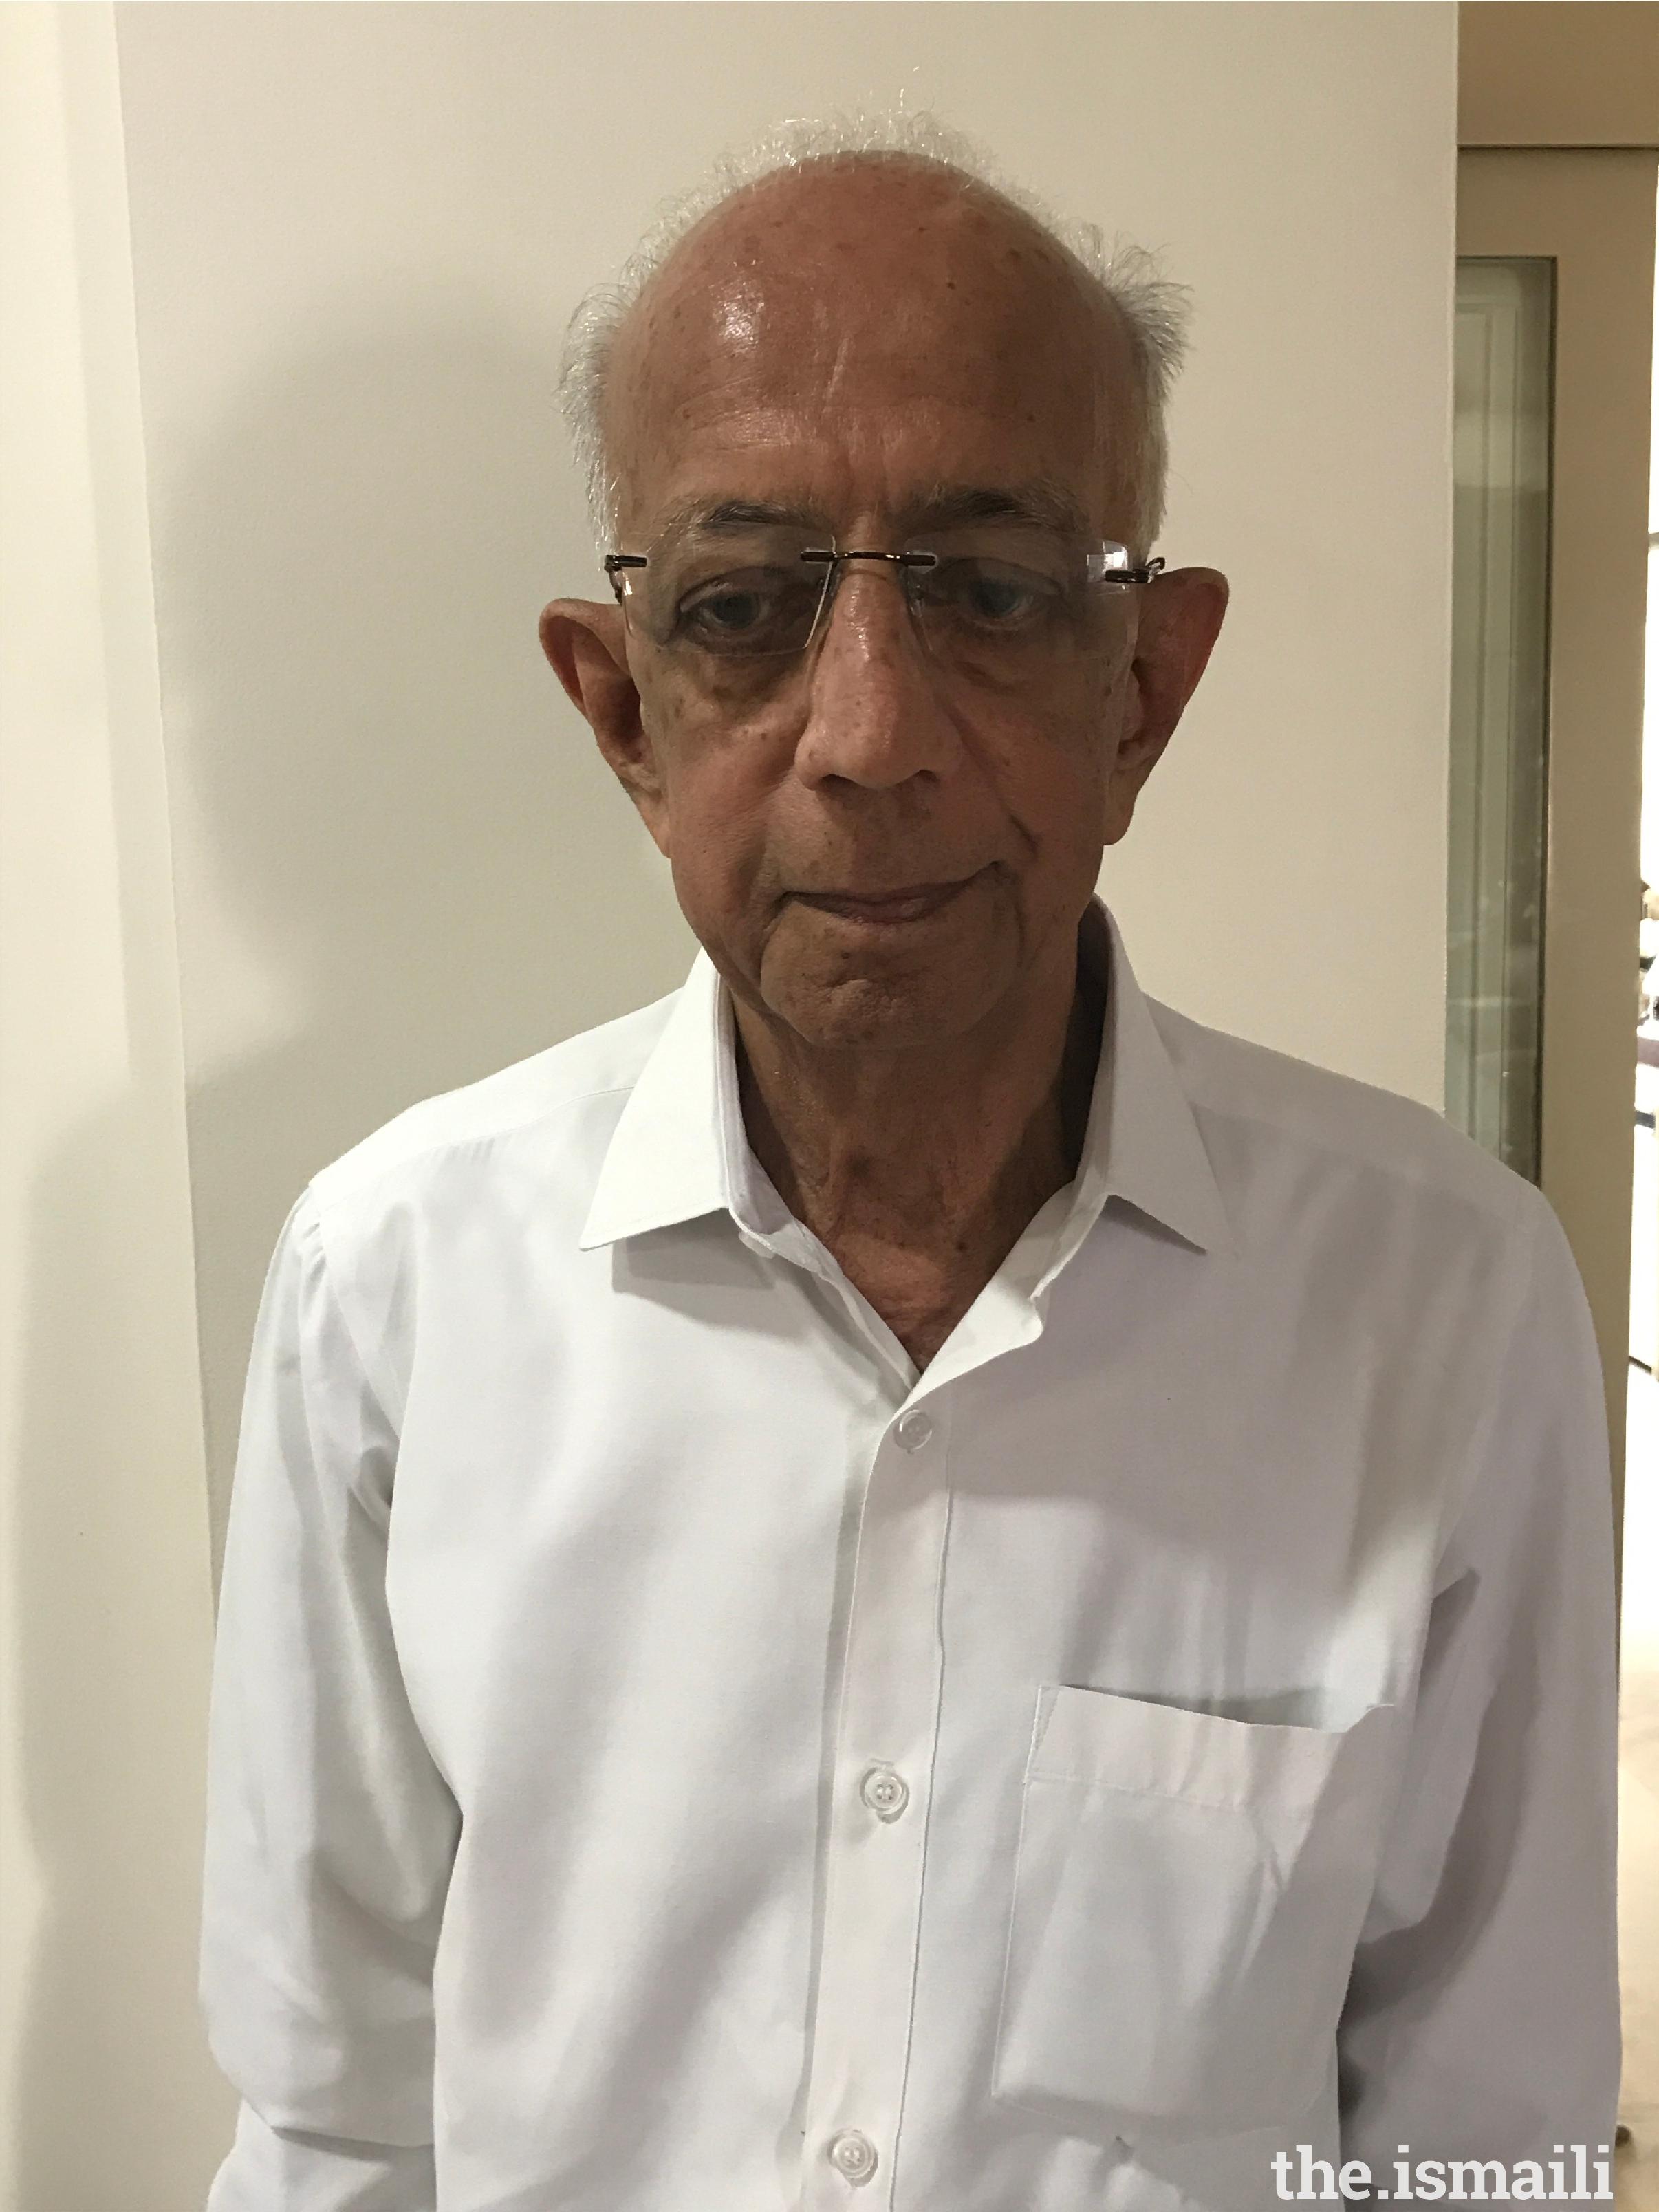 Alijah Kabiruddin Moosabhai Dhamani, 84 years, Hyderabad